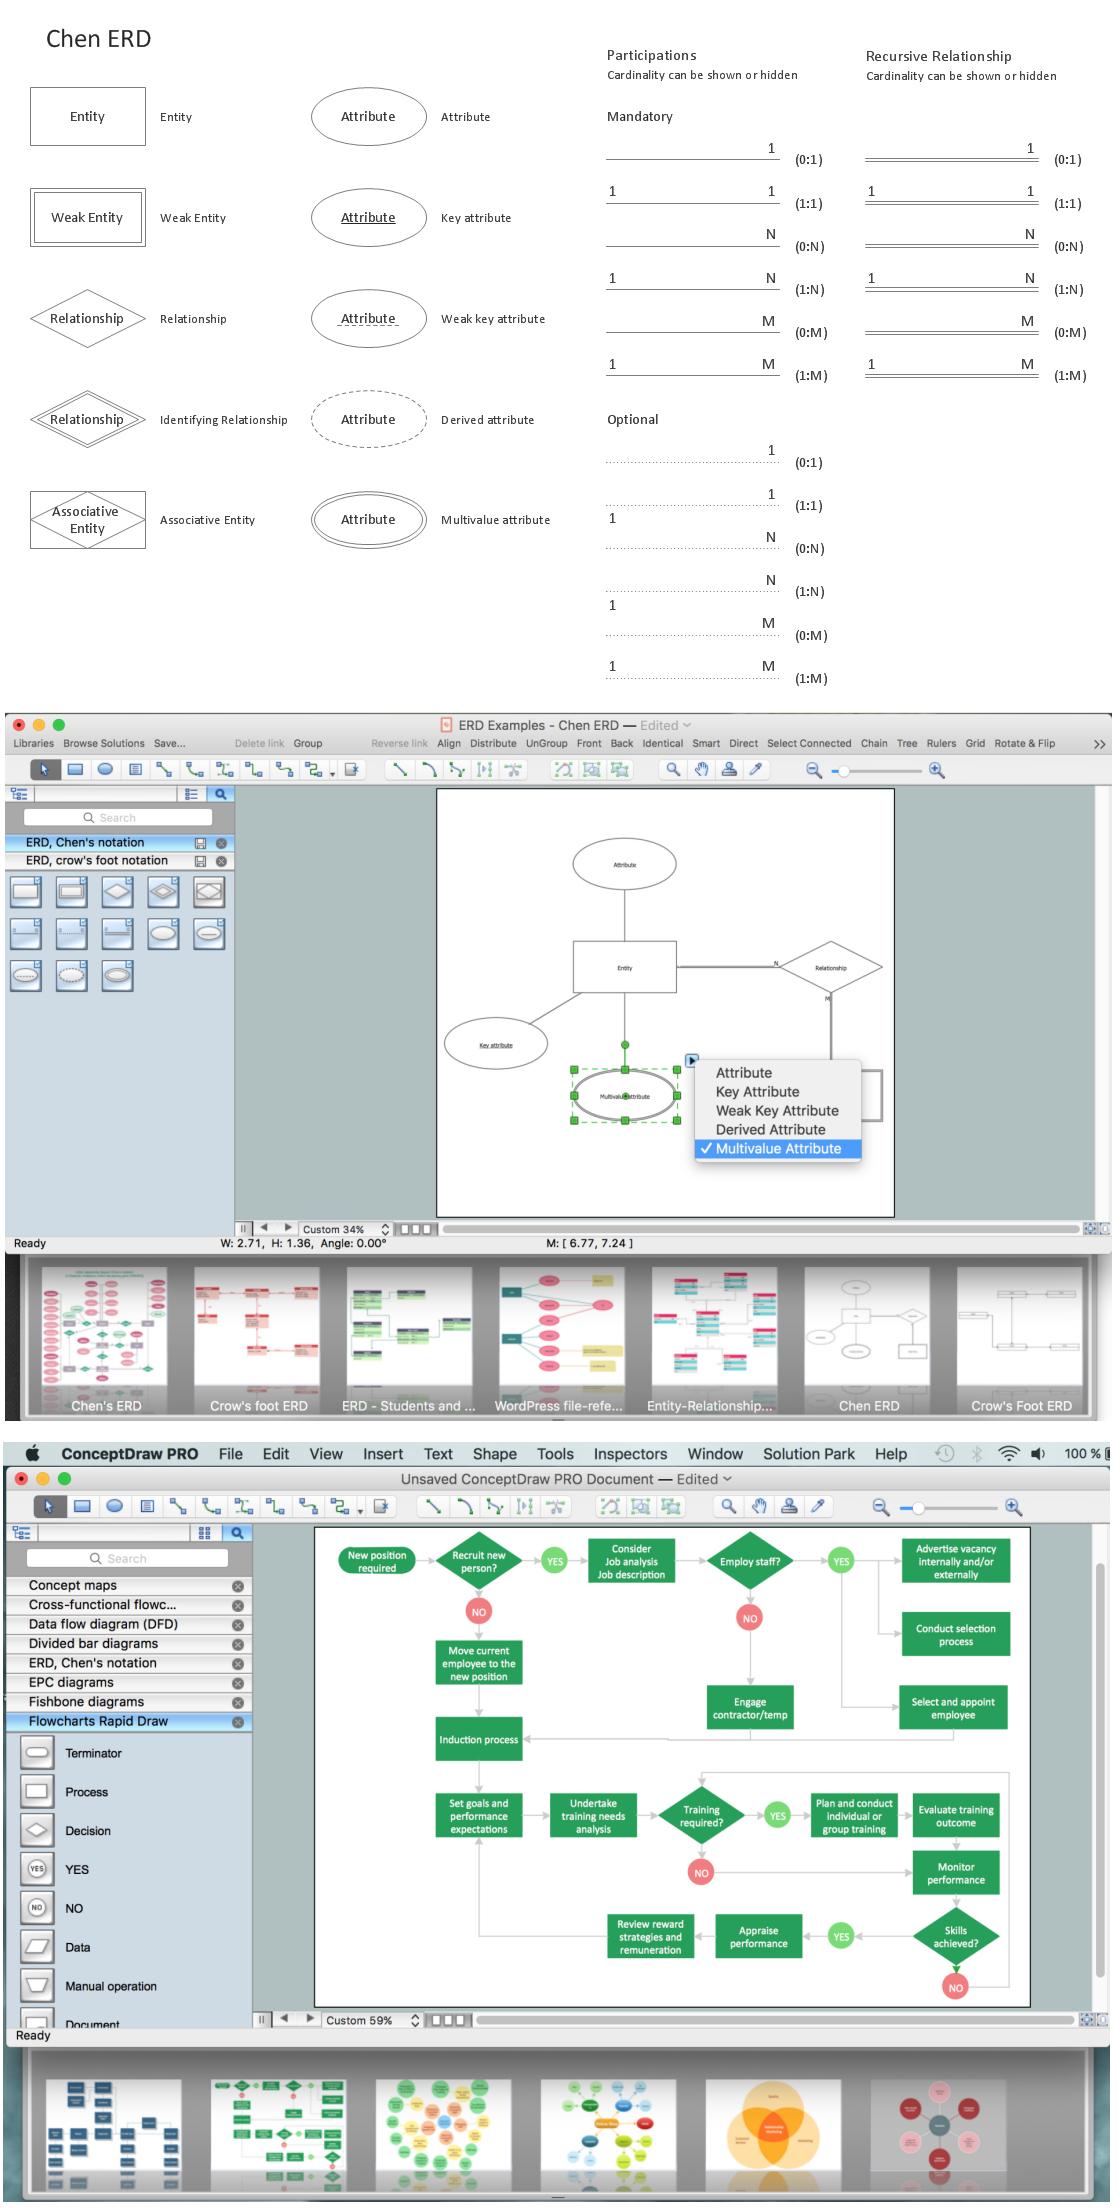 Entity Relationship Diagram | Design Element — Chen throughout Er Diagram 0 1